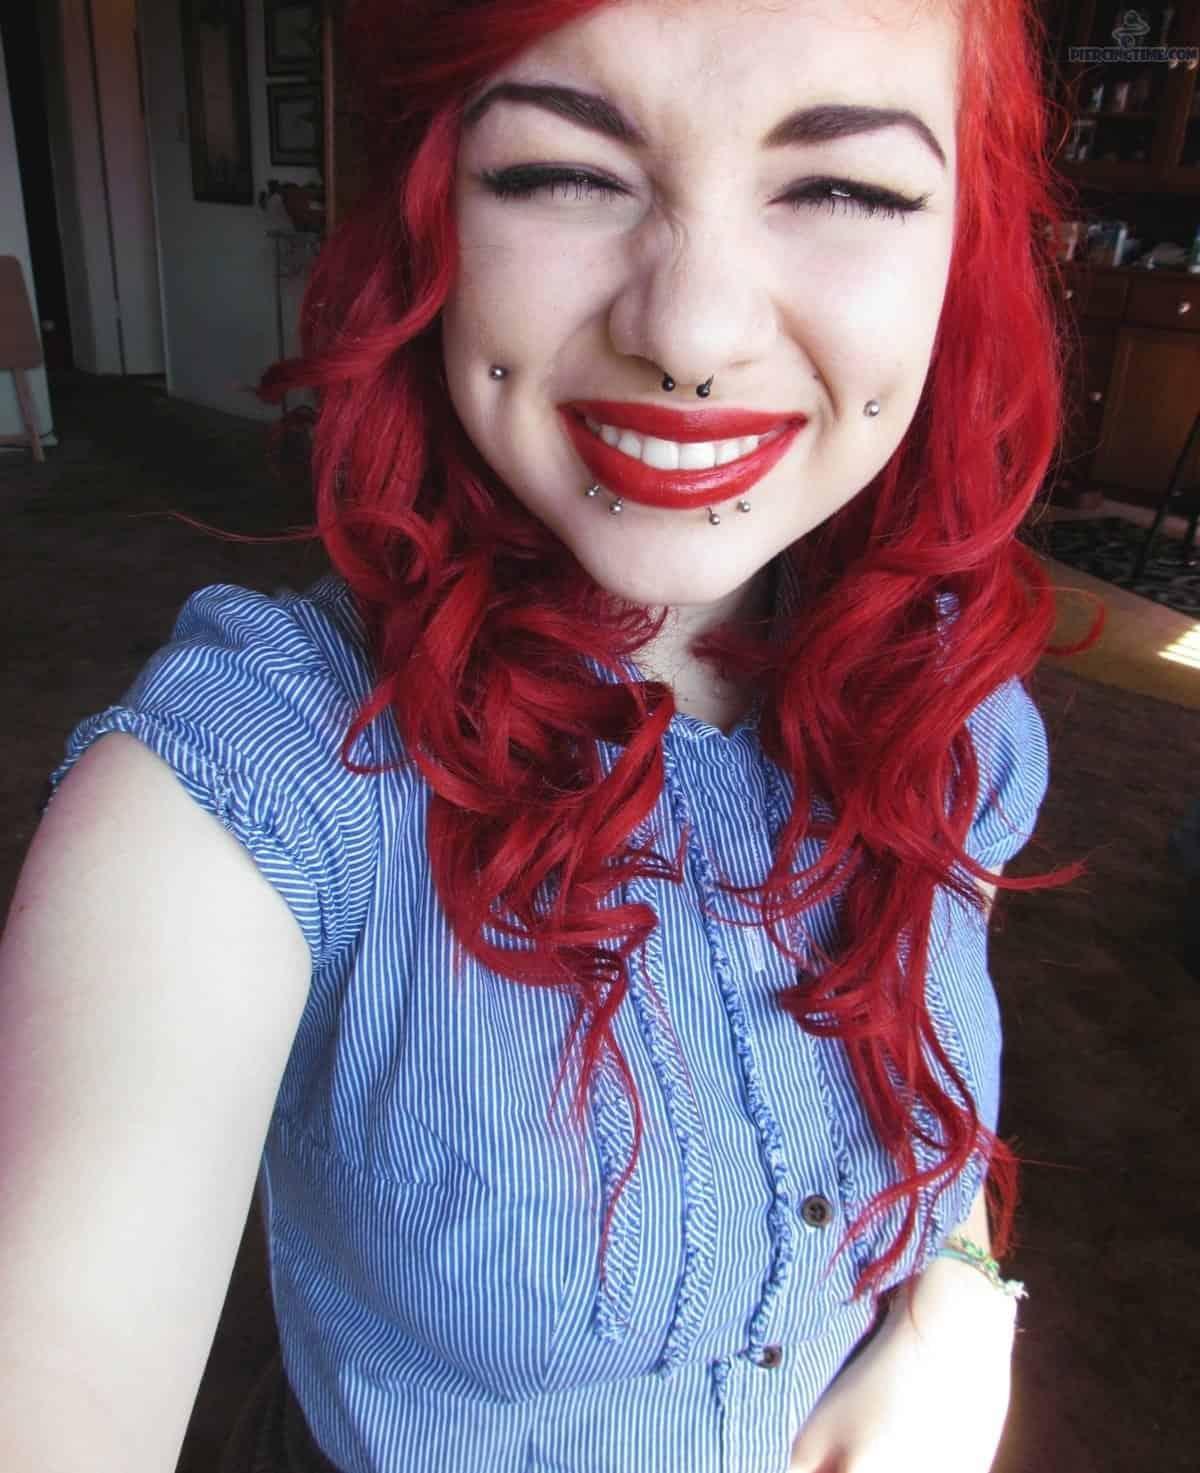 Very Cute Girl With Dimple Cheek Piercing